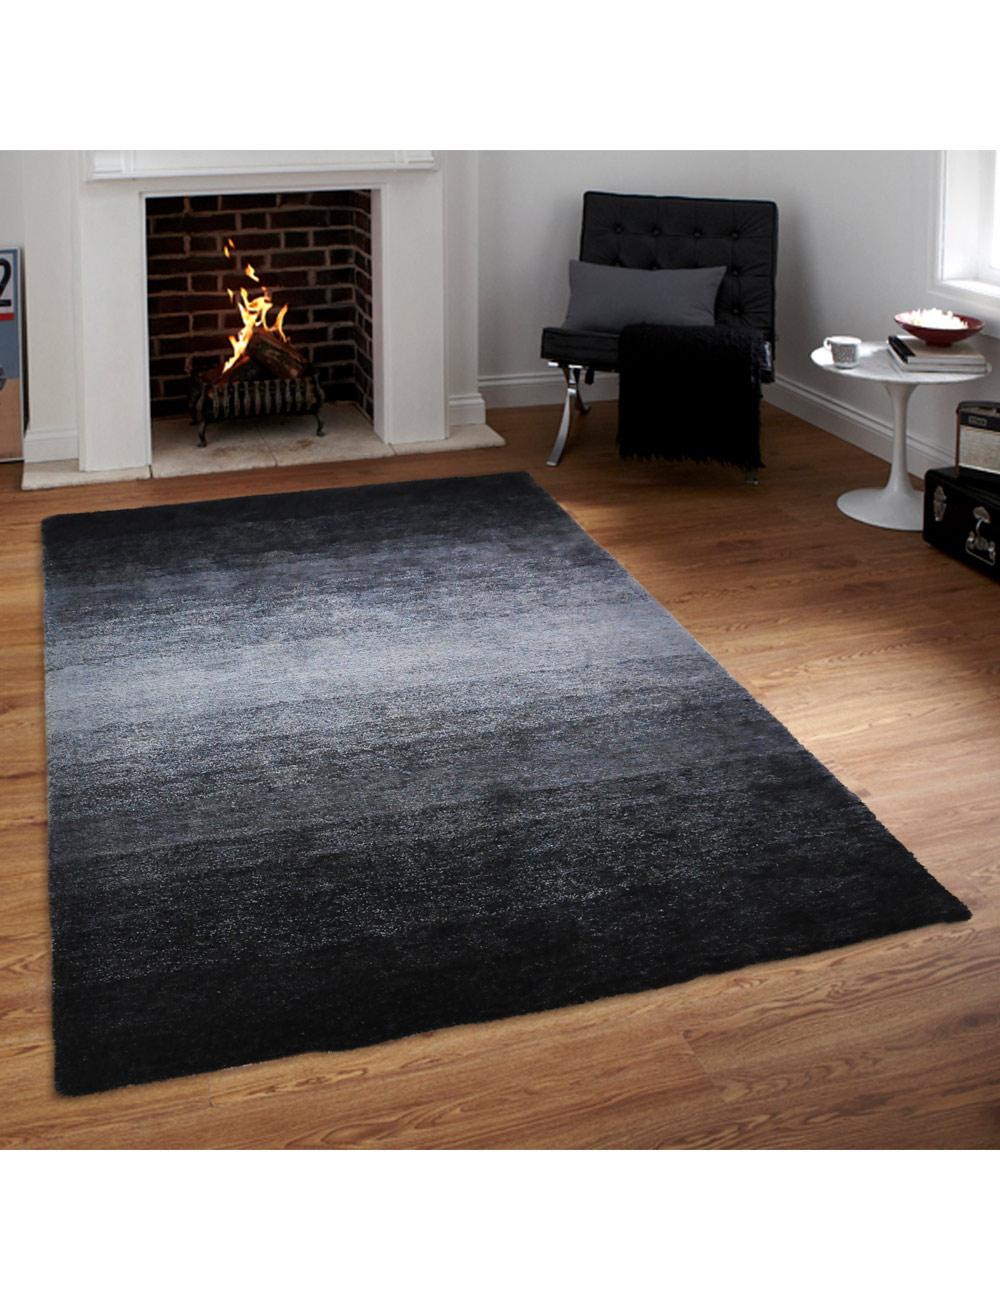 teppich shine schwarz grau 160 x 230 cm. Black Bedroom Furniture Sets. Home Design Ideas